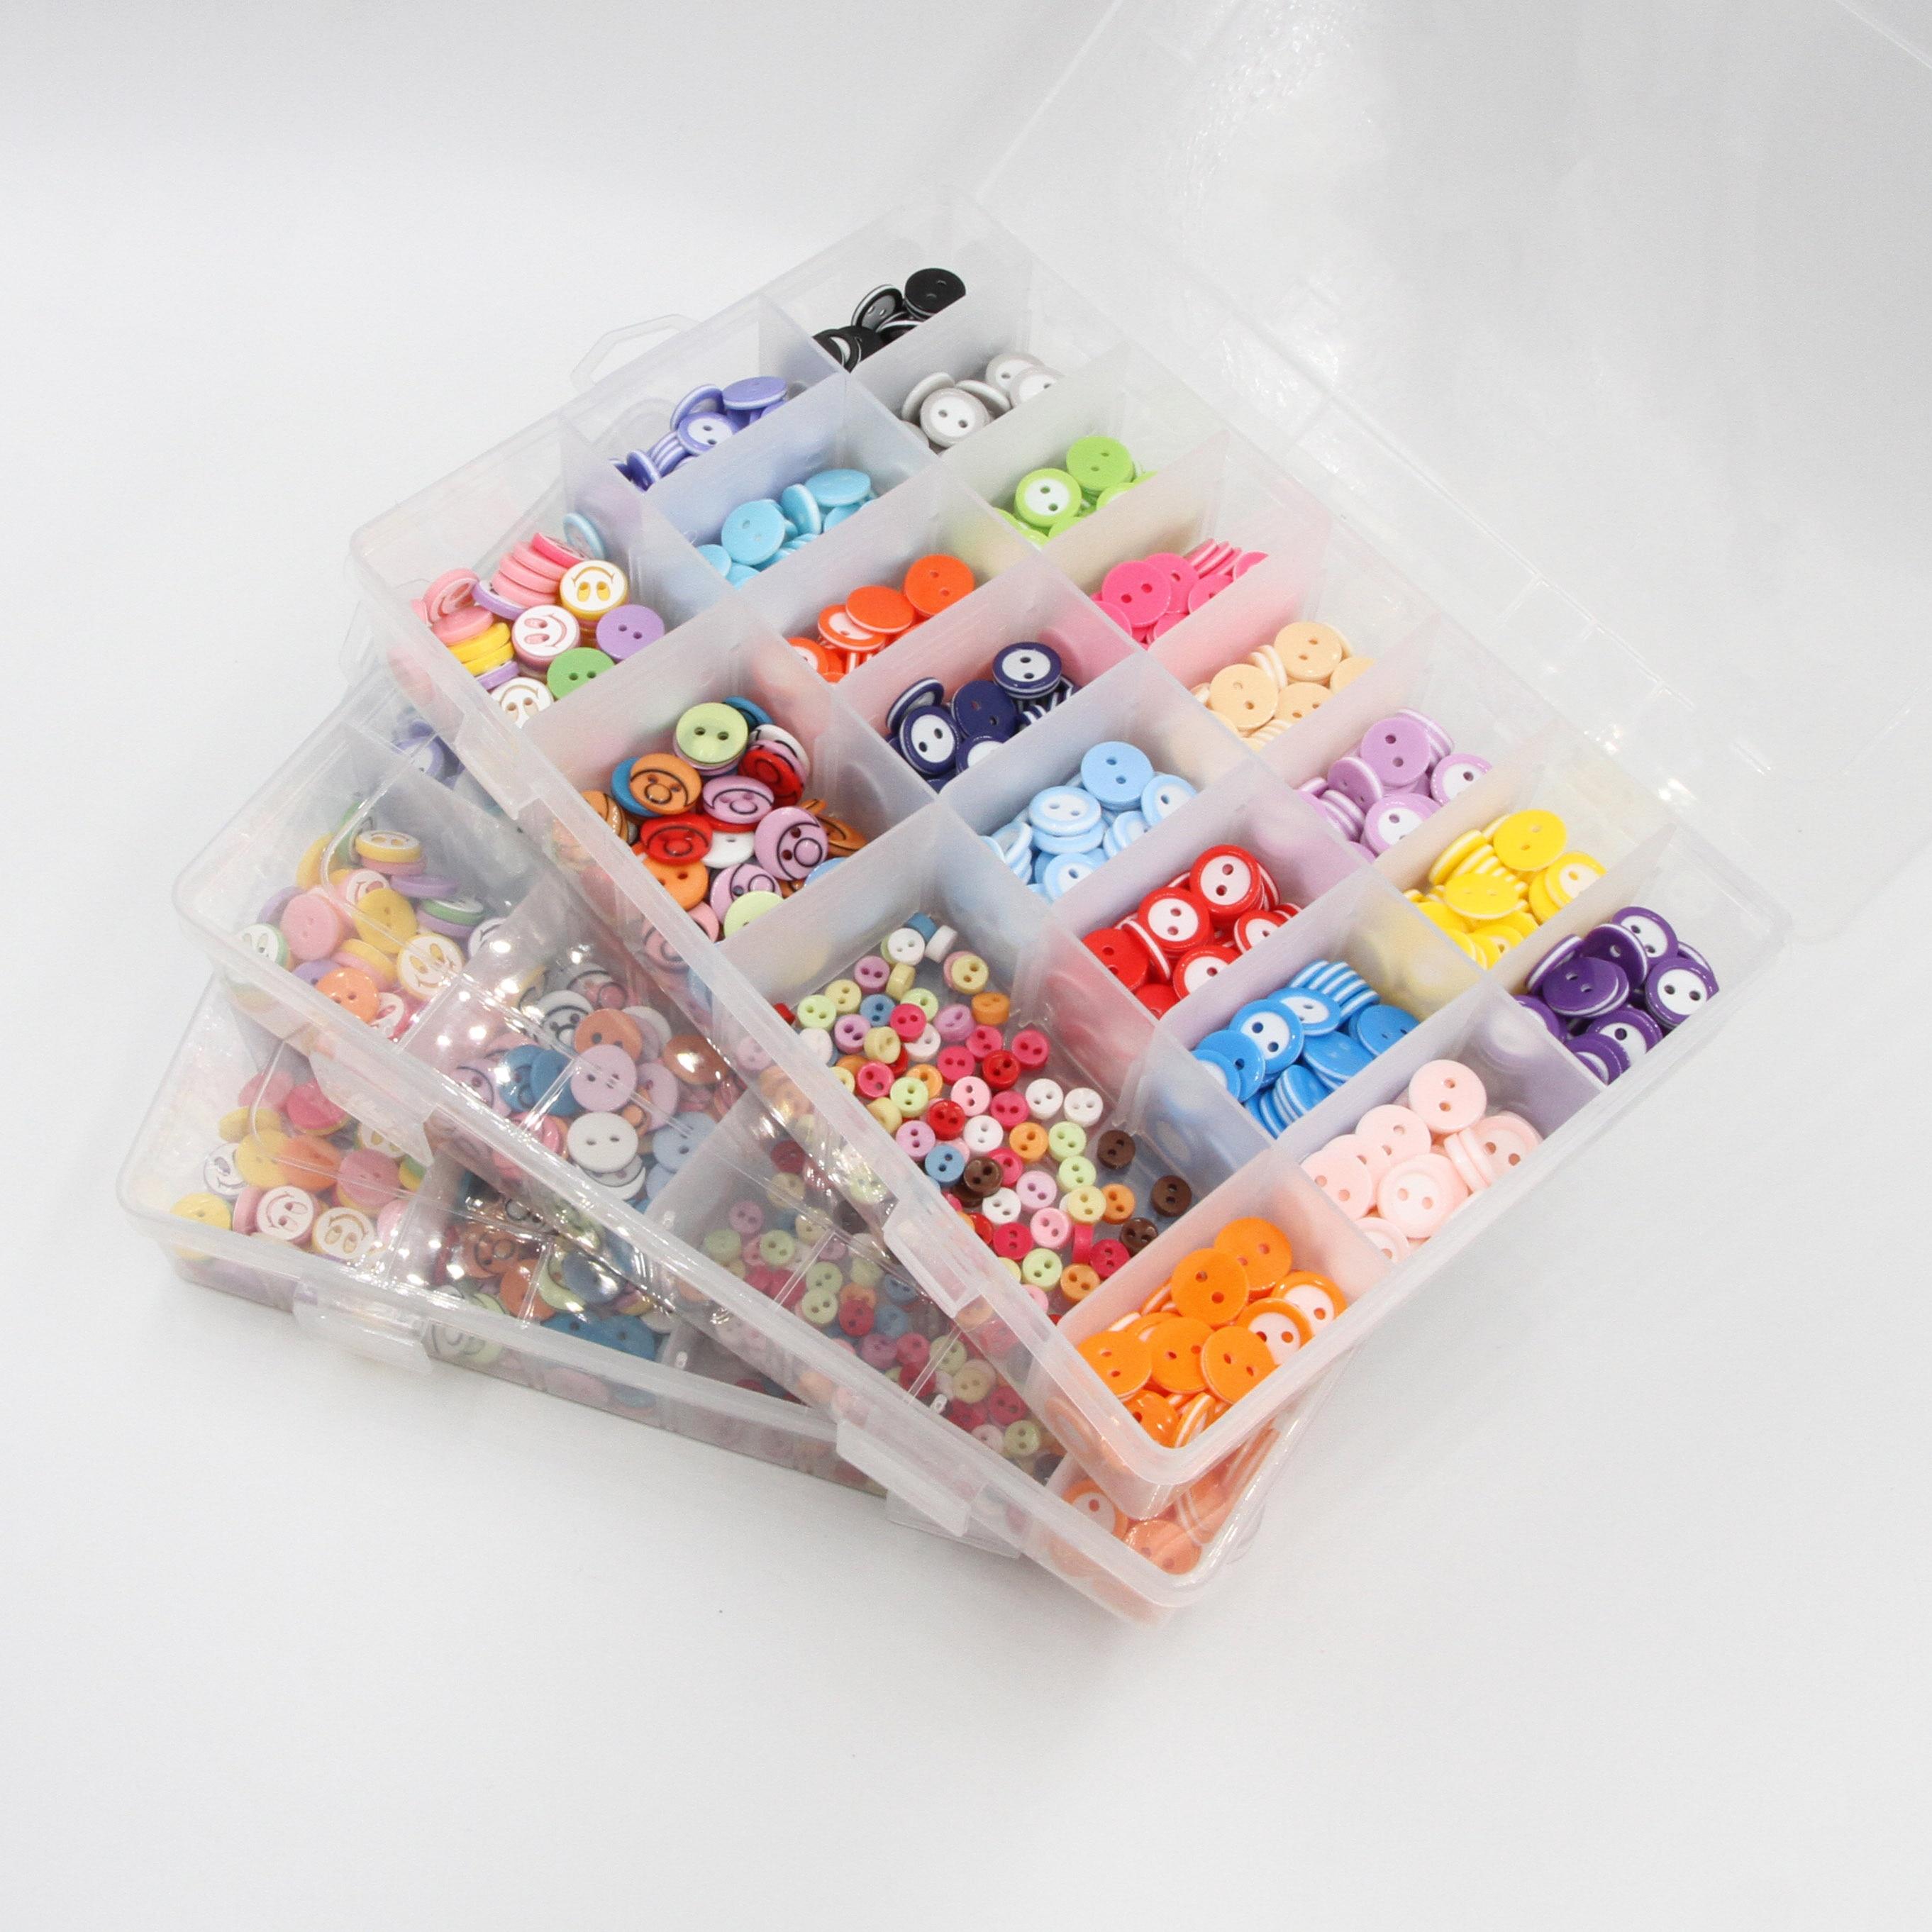 6set 150pcs To 1050pcs Kids Sewing Button Package Plastic Clothes Garment Accessories Kids Diy Scrapbooking